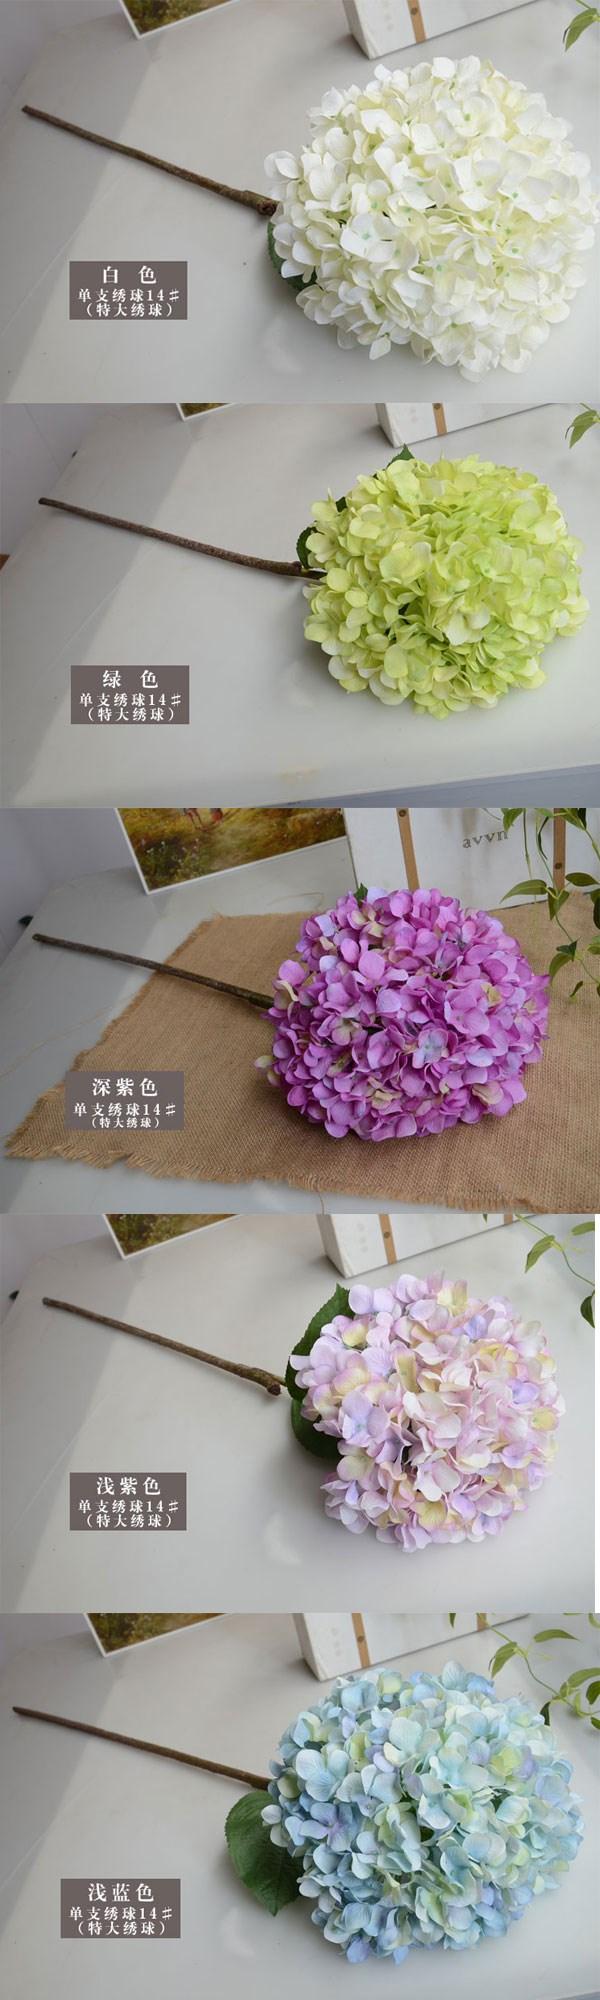 300 503 800 Hand Made Hydrangea Artificial Flower Wholesale Silk